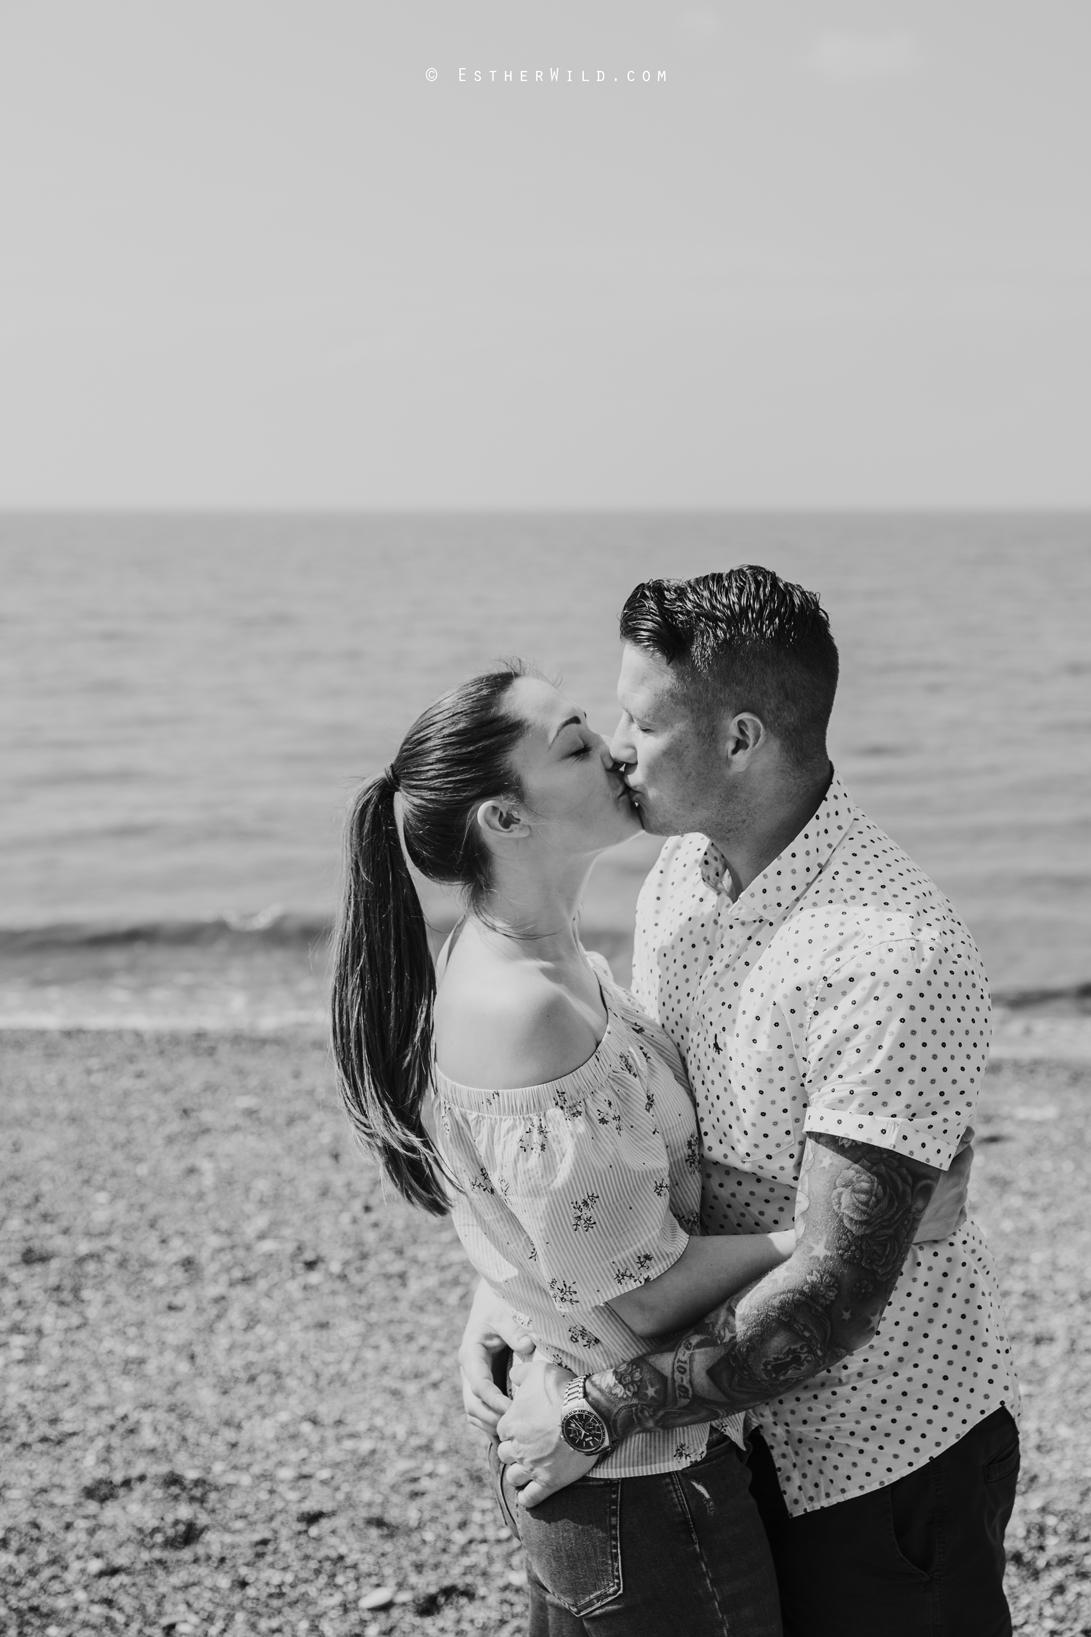 Heacham_Photo_Session_Engagement_Love_Pre-Wedding_IMG_4290-2.jpg